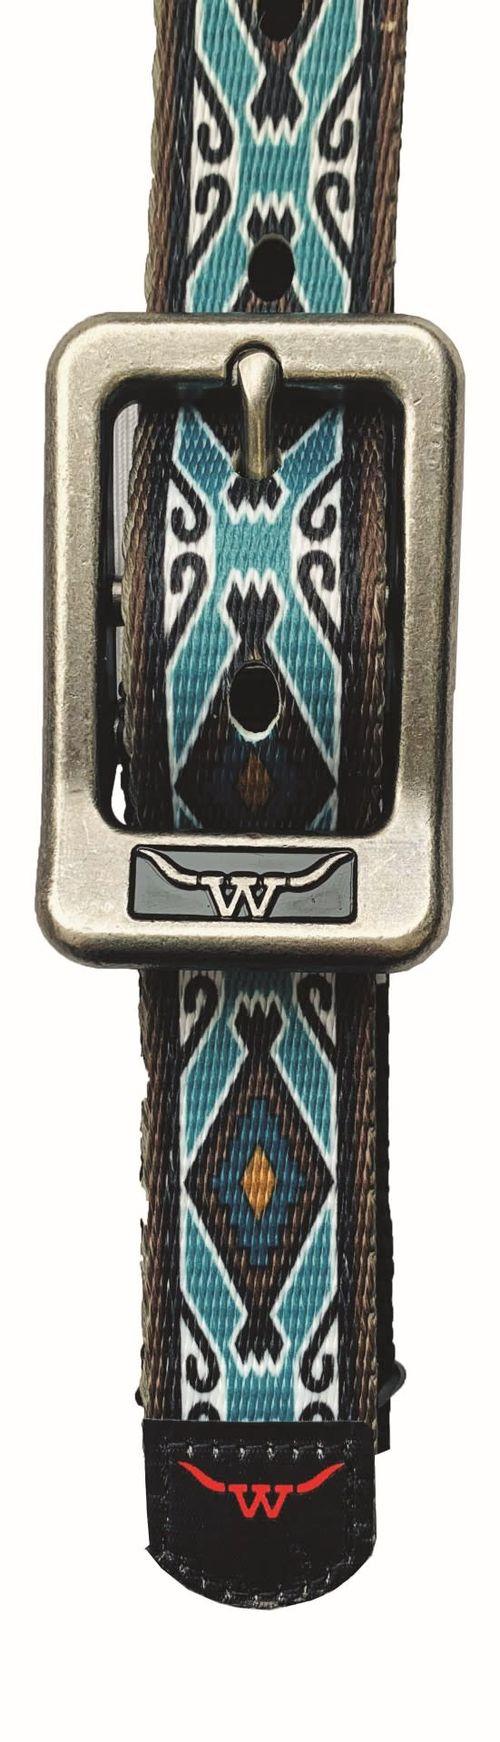 Western Rawhide Signature Pattern Halter - Black/Rhombus